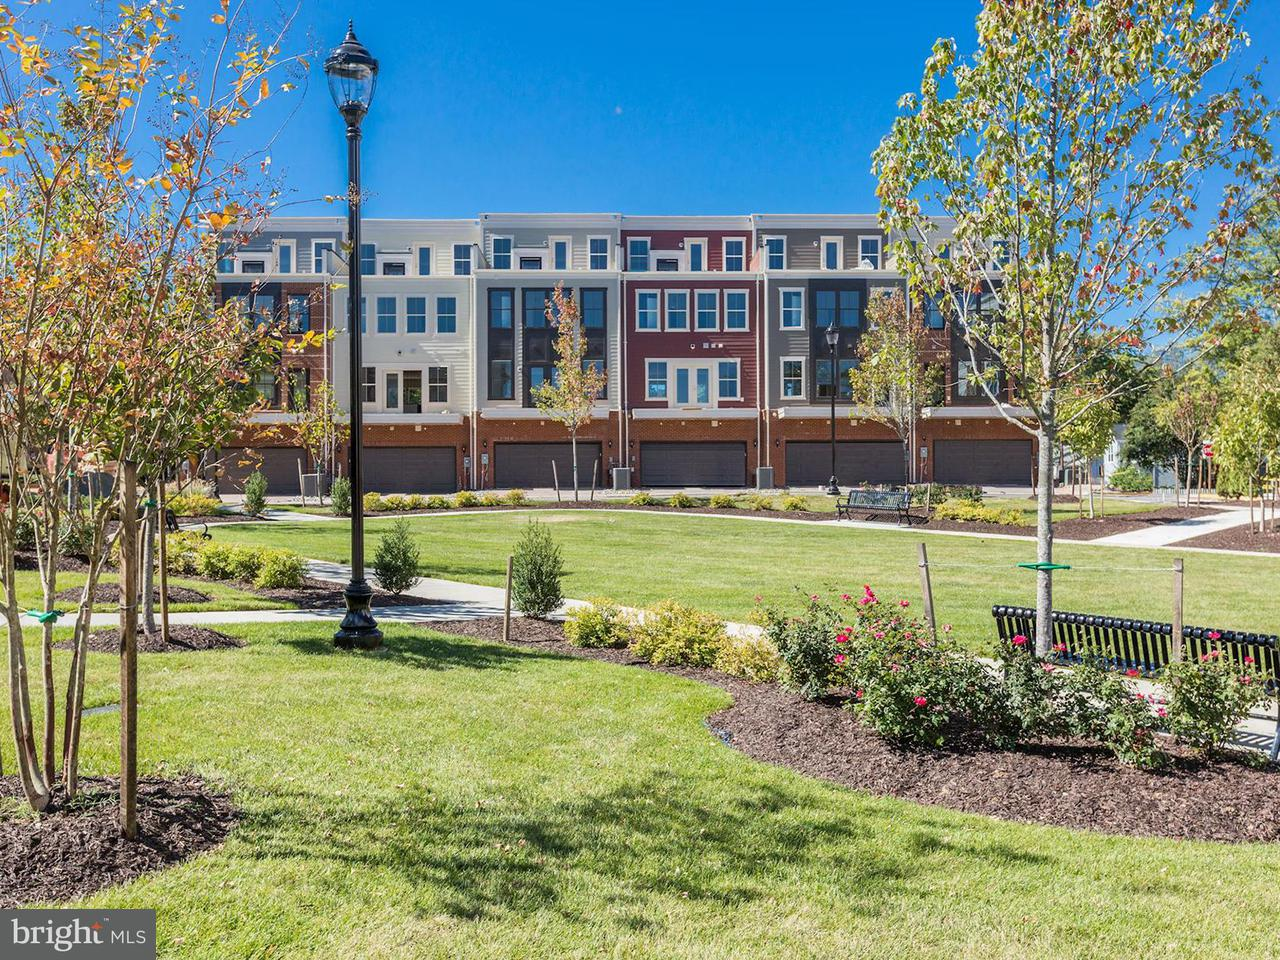 Additional photo for property listing at 3985 Norton Pl #301 3985 Norton Pl #301 Fairfax, 弗吉尼亚州 22030 美国